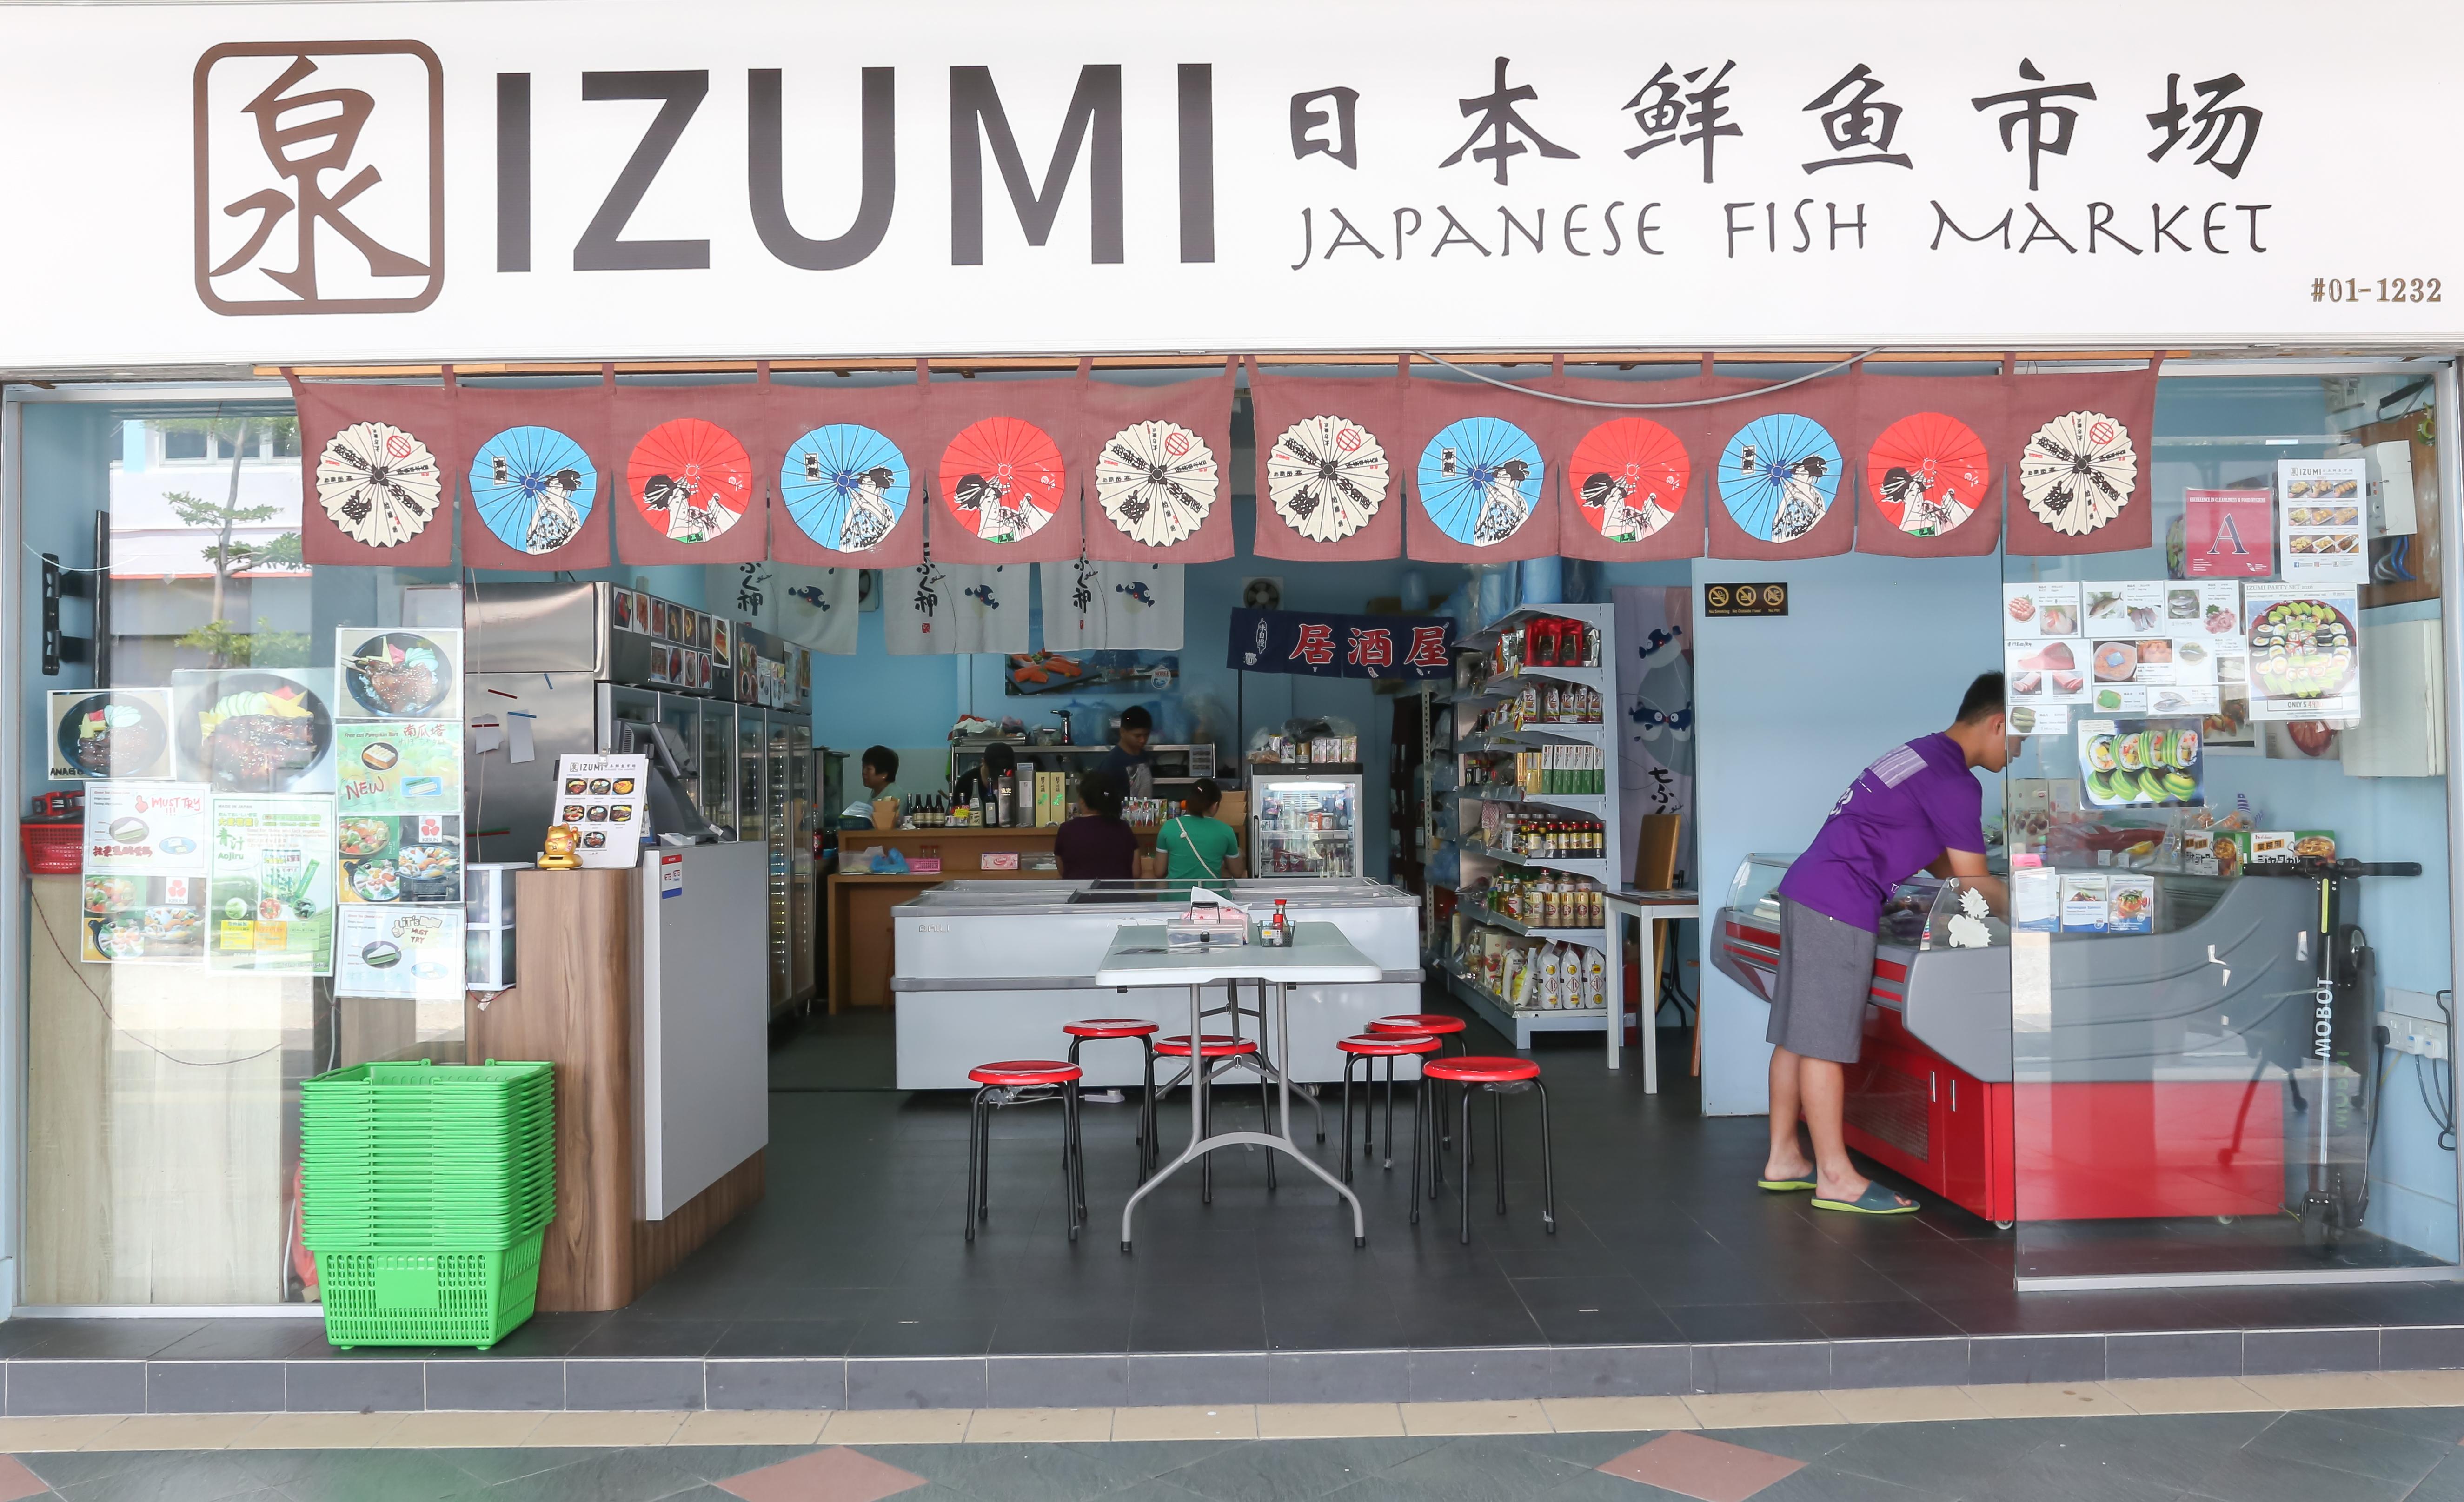 Izumi Japanese Fish Market Shopfront